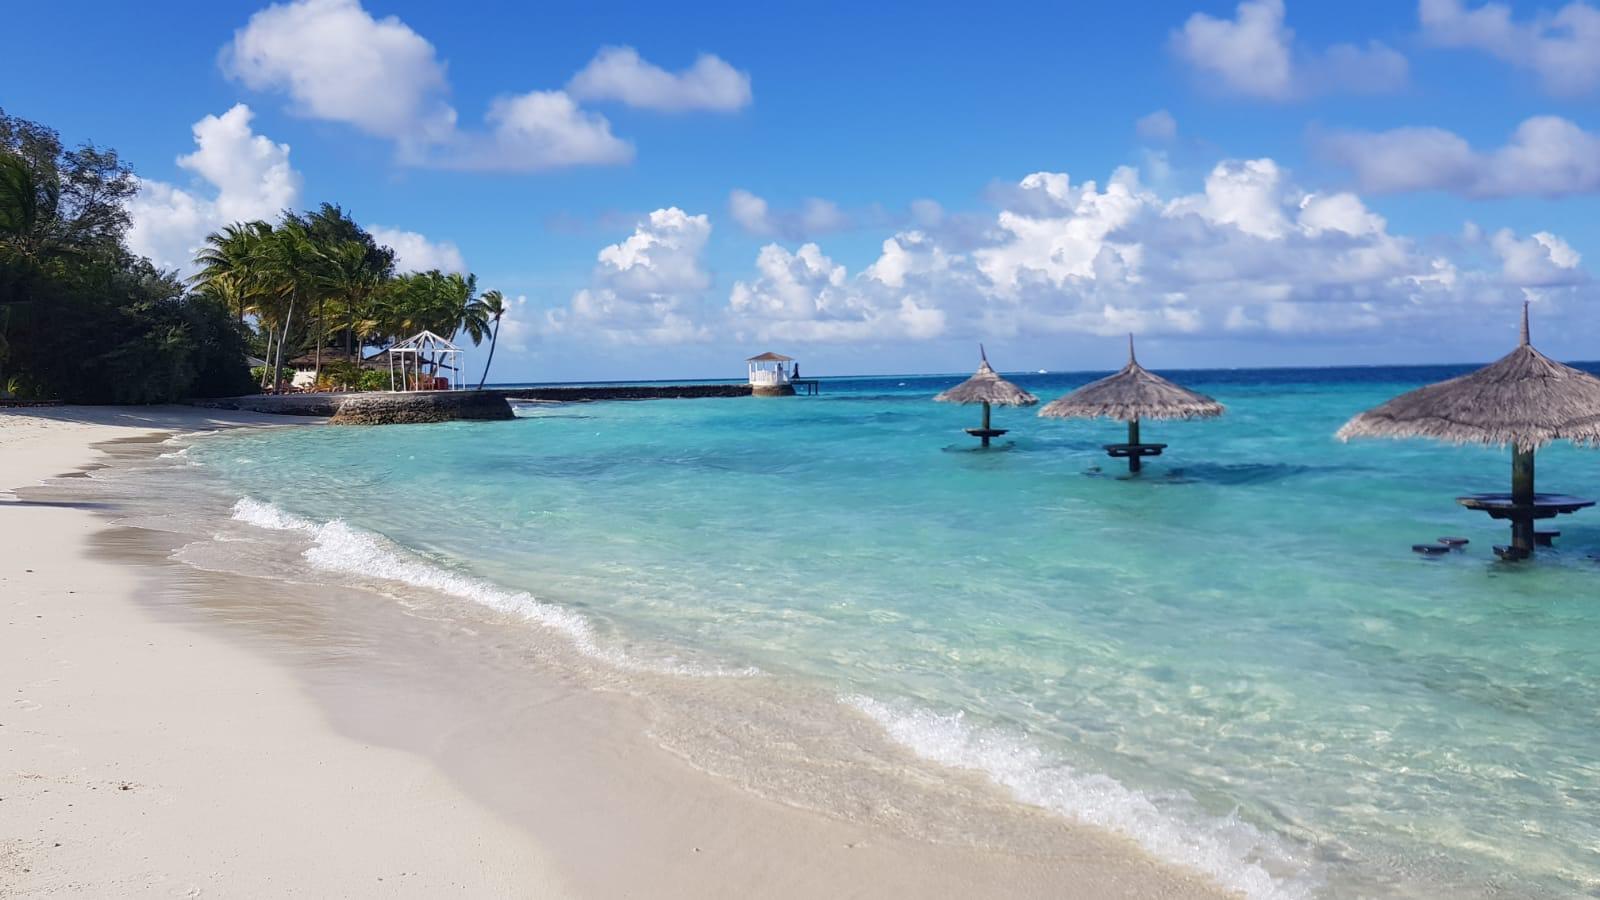 invite-to-paradise-sri-lanka-maldives-holiday-honeymoon-specialists-customer-guest-feedback-zane-lisa-butcher-centara-ras-fushi-beach.png